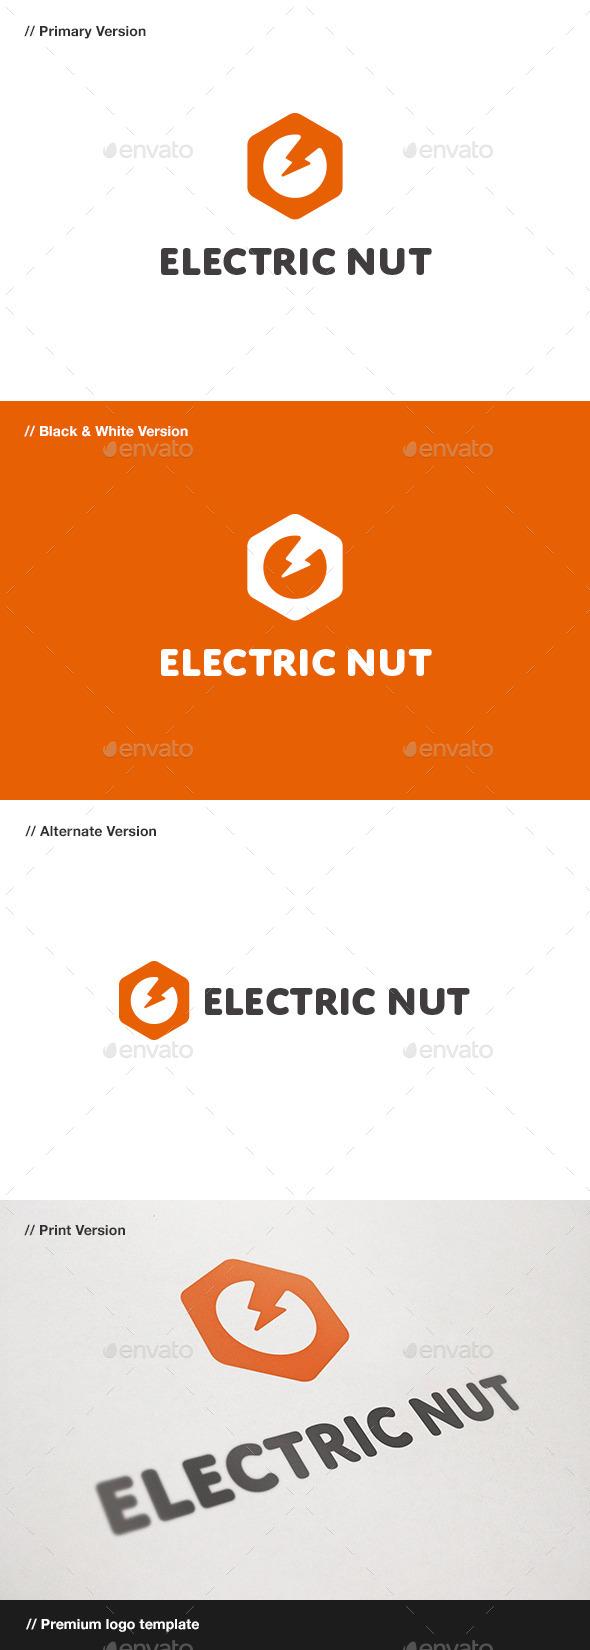 GraphicRiver Electric Nut Logo 10958283